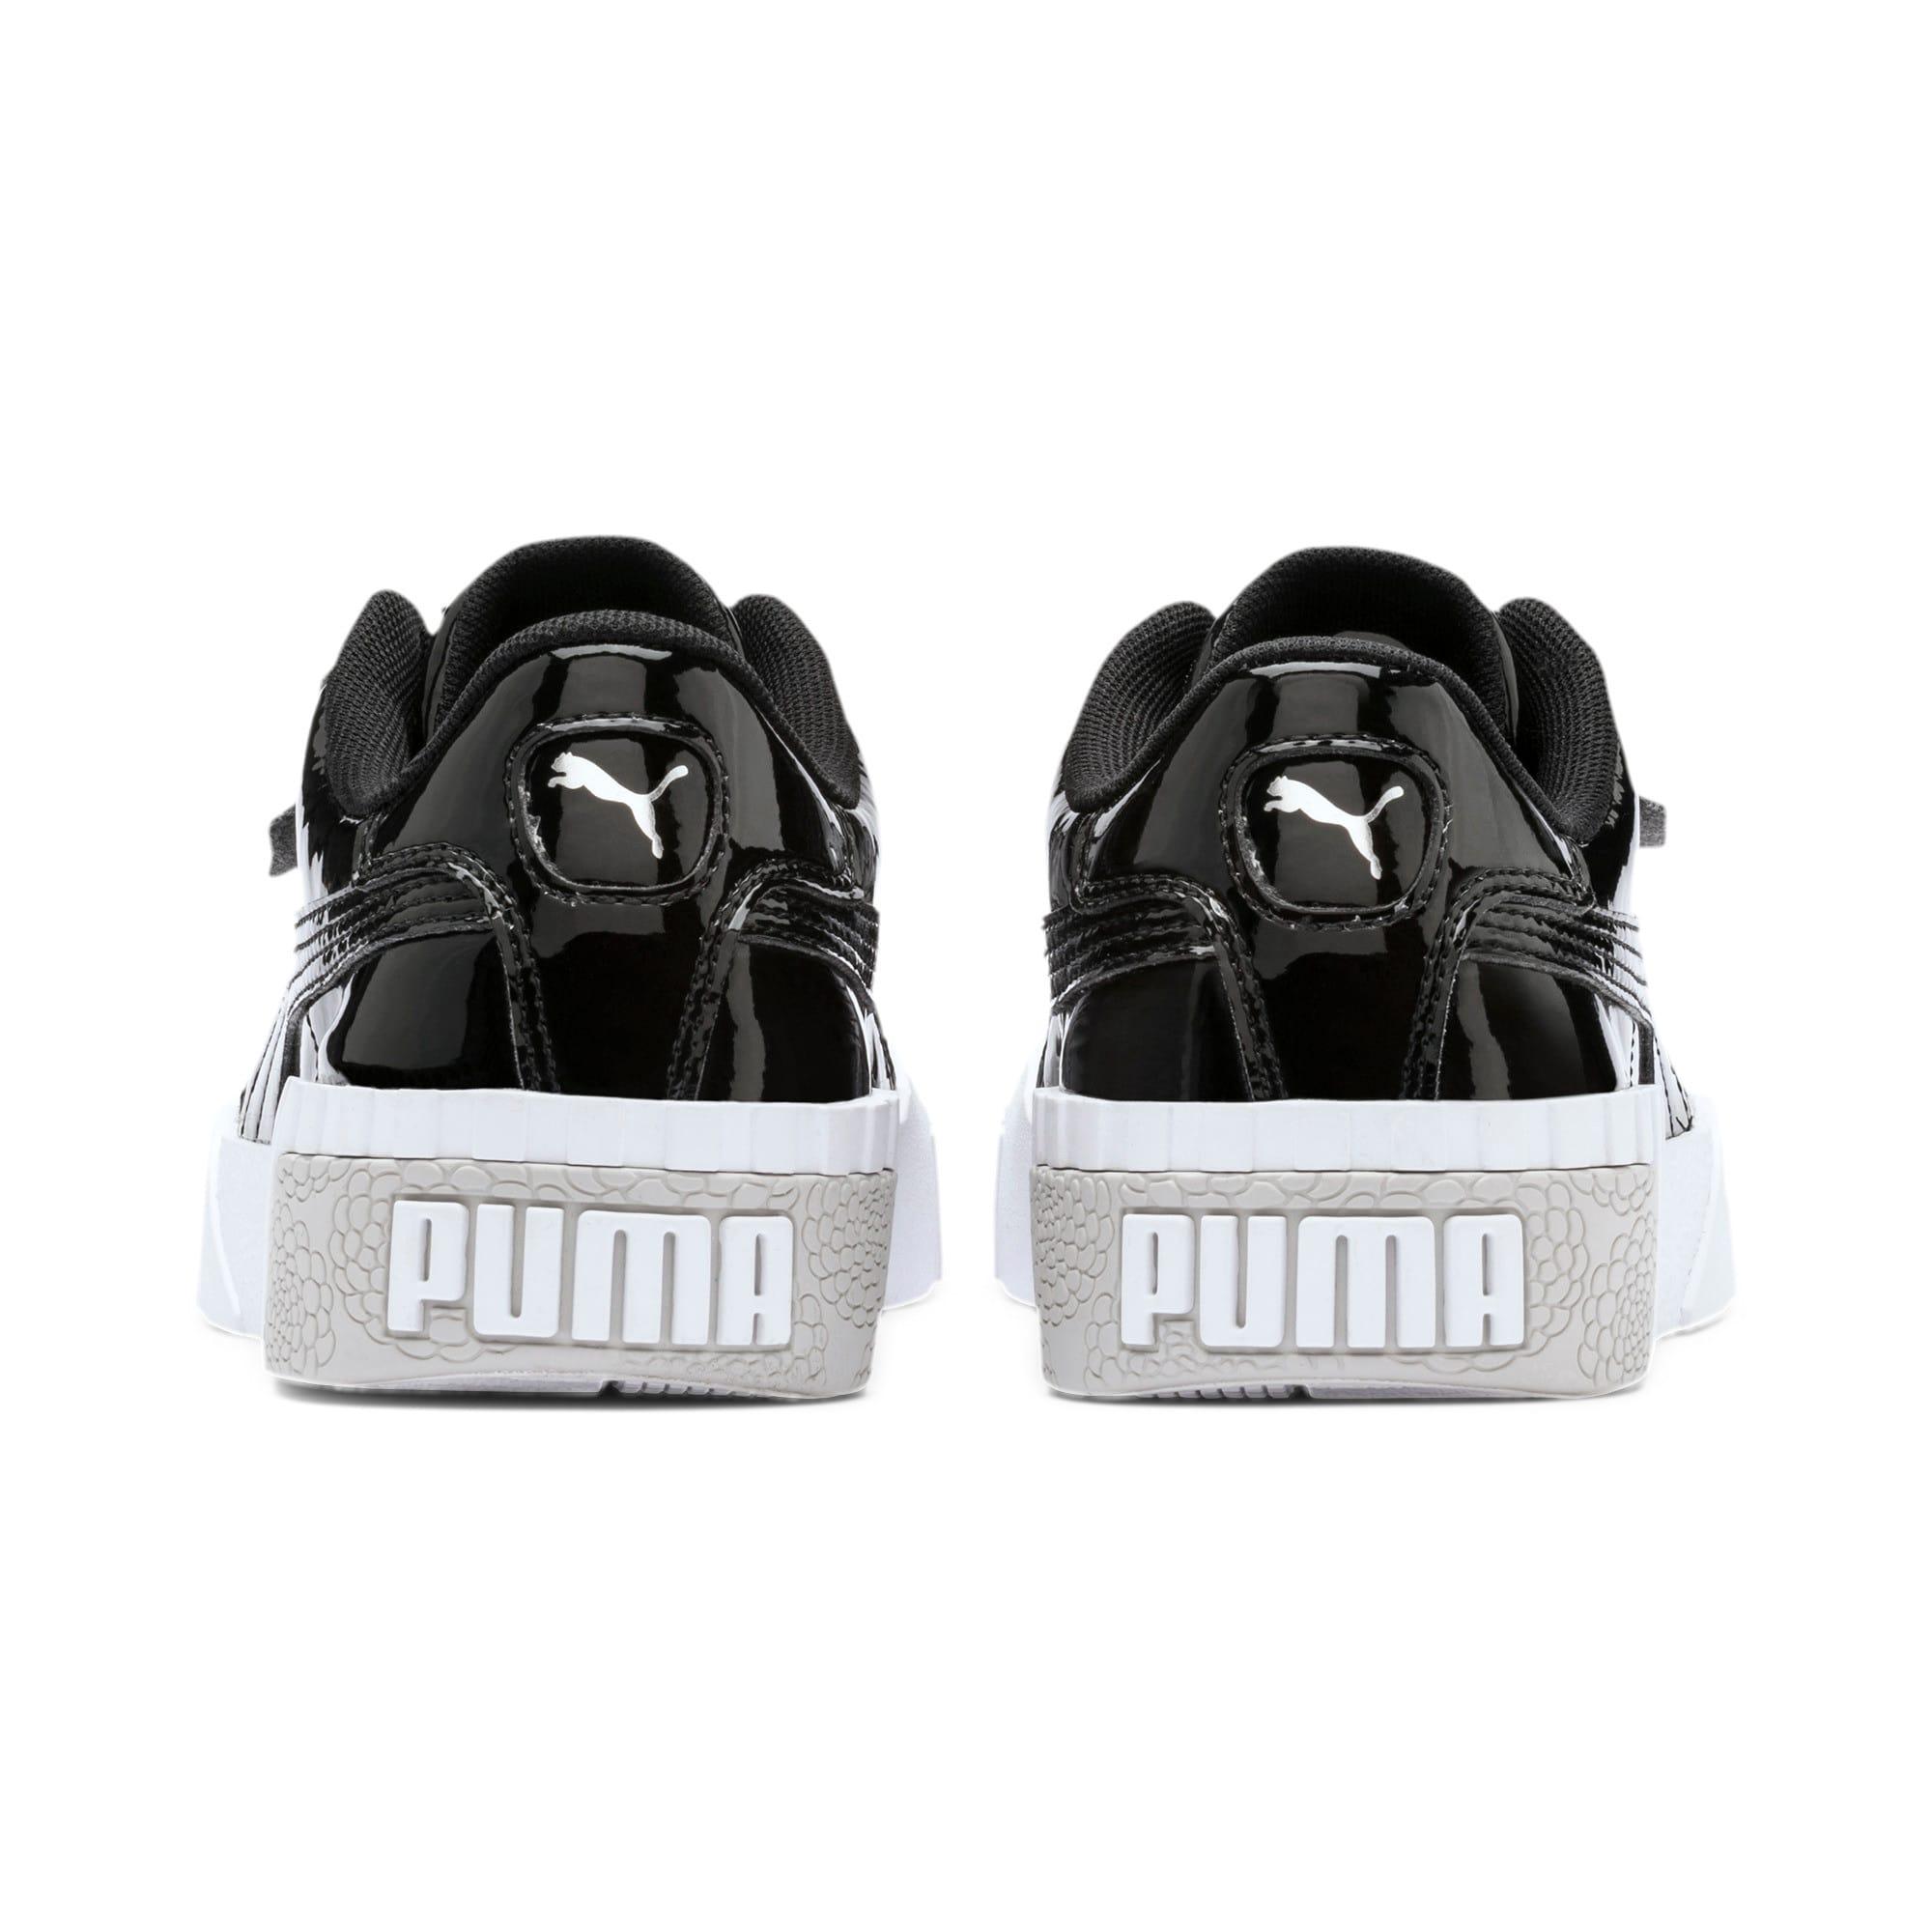 Thumbnail 3 of Cali Patent Sneakers JR, Puma Black-Puma White, medium